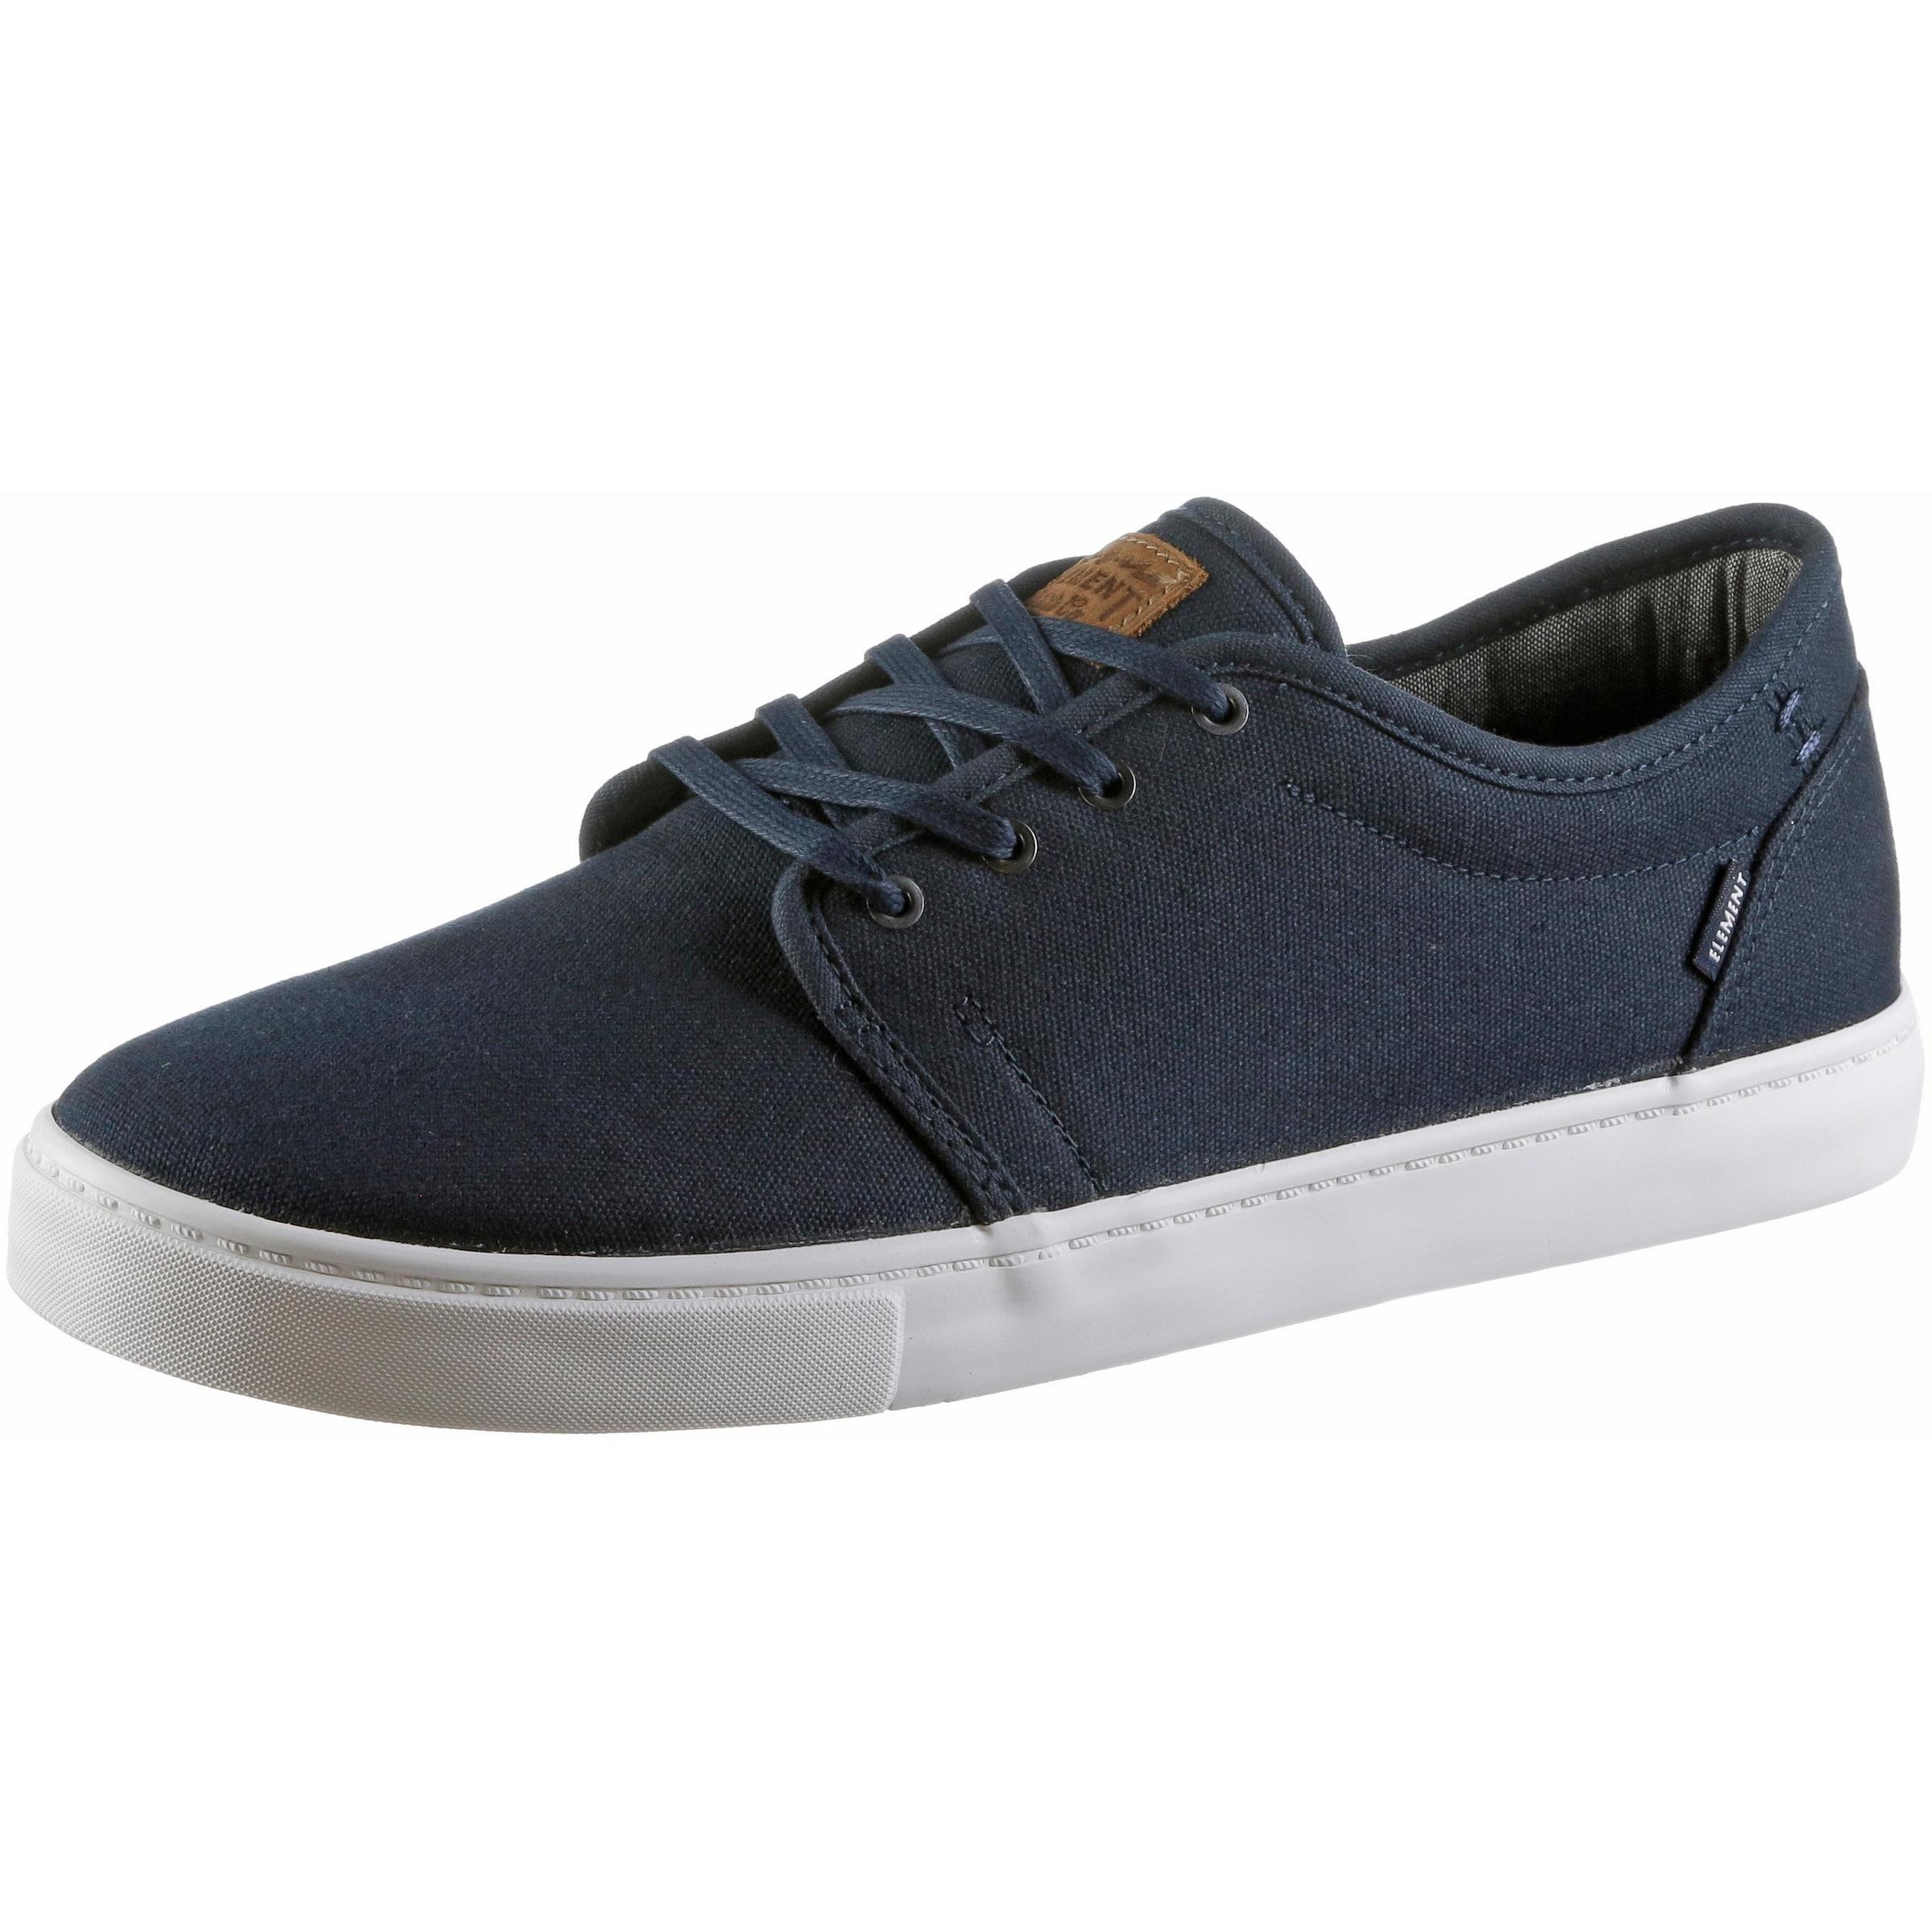 Haltbare Mode billige Schuhe ELEMENT   DARWIN Sneaker Herren Schuhe Gut getragene Schuhe